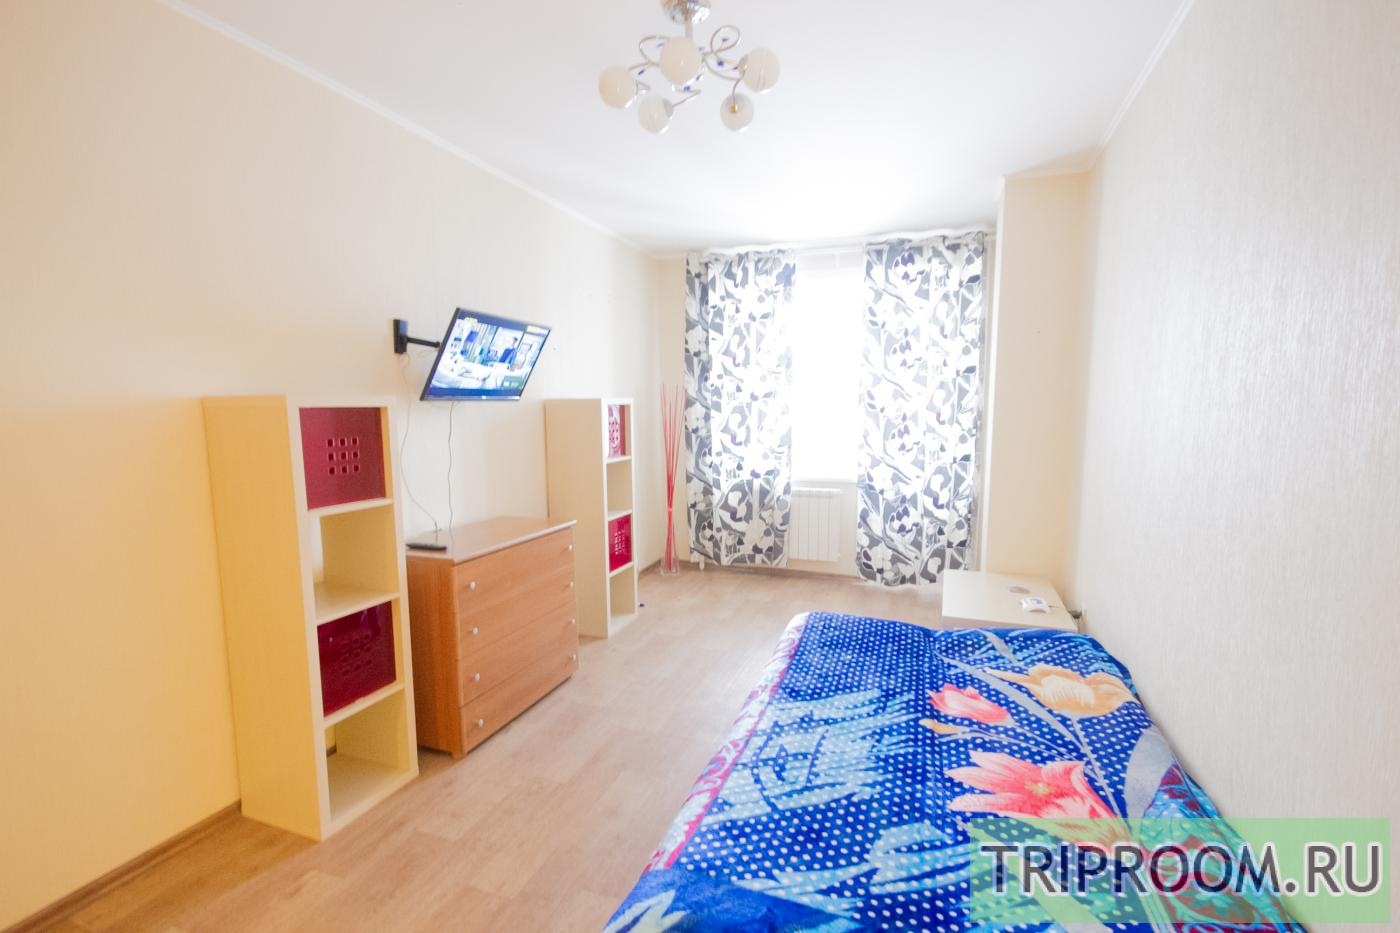 1-комнатная квартира посуточно (вариант № 9382), ул. Галущака улица, фото № 3